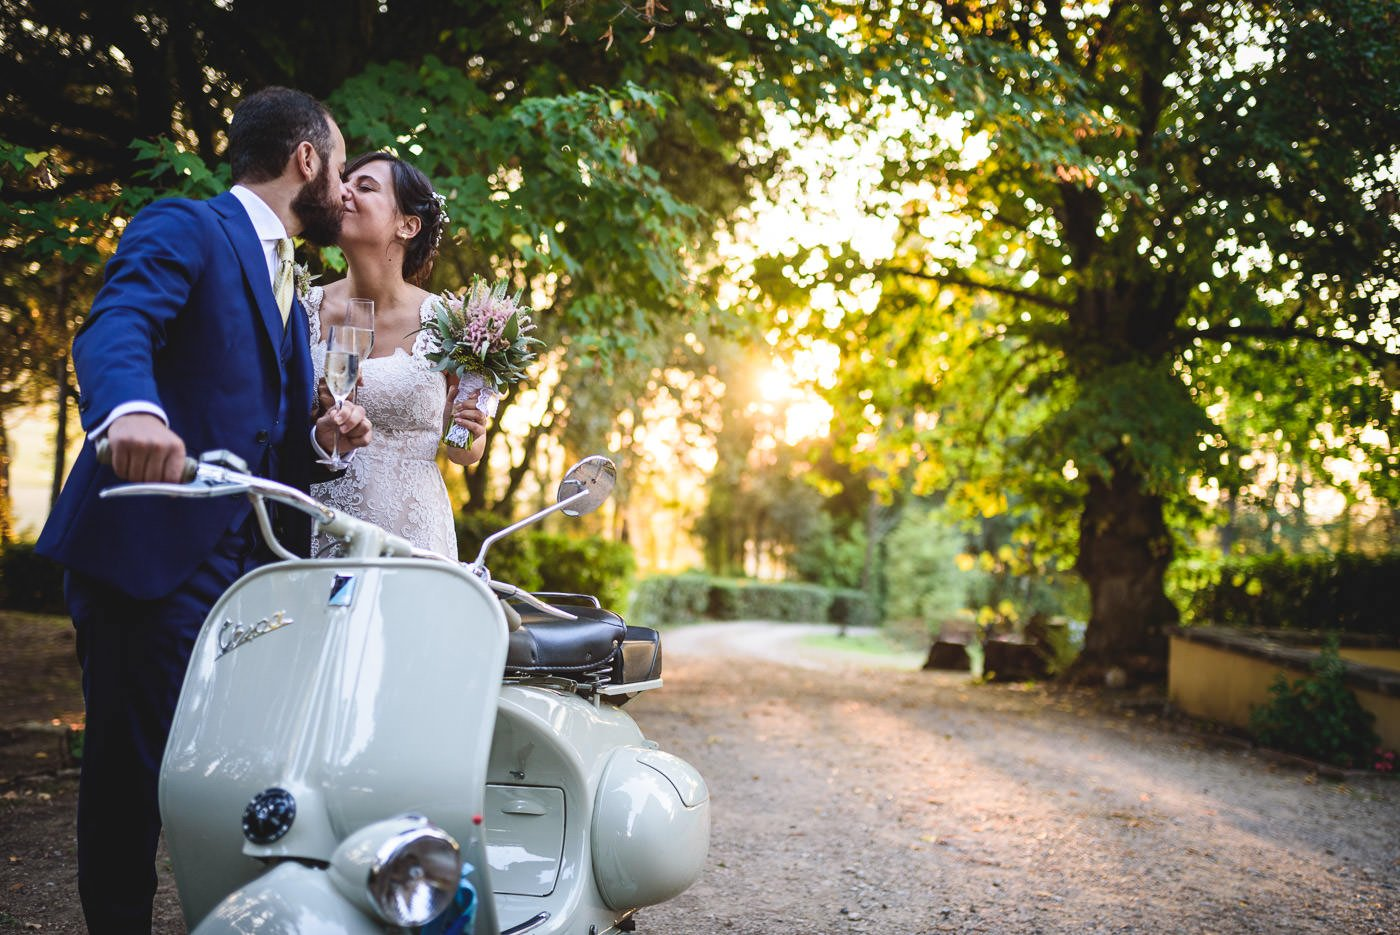 Matrimonio Giulia & Federico 09_15 – Alessio Nobili Photographer-42